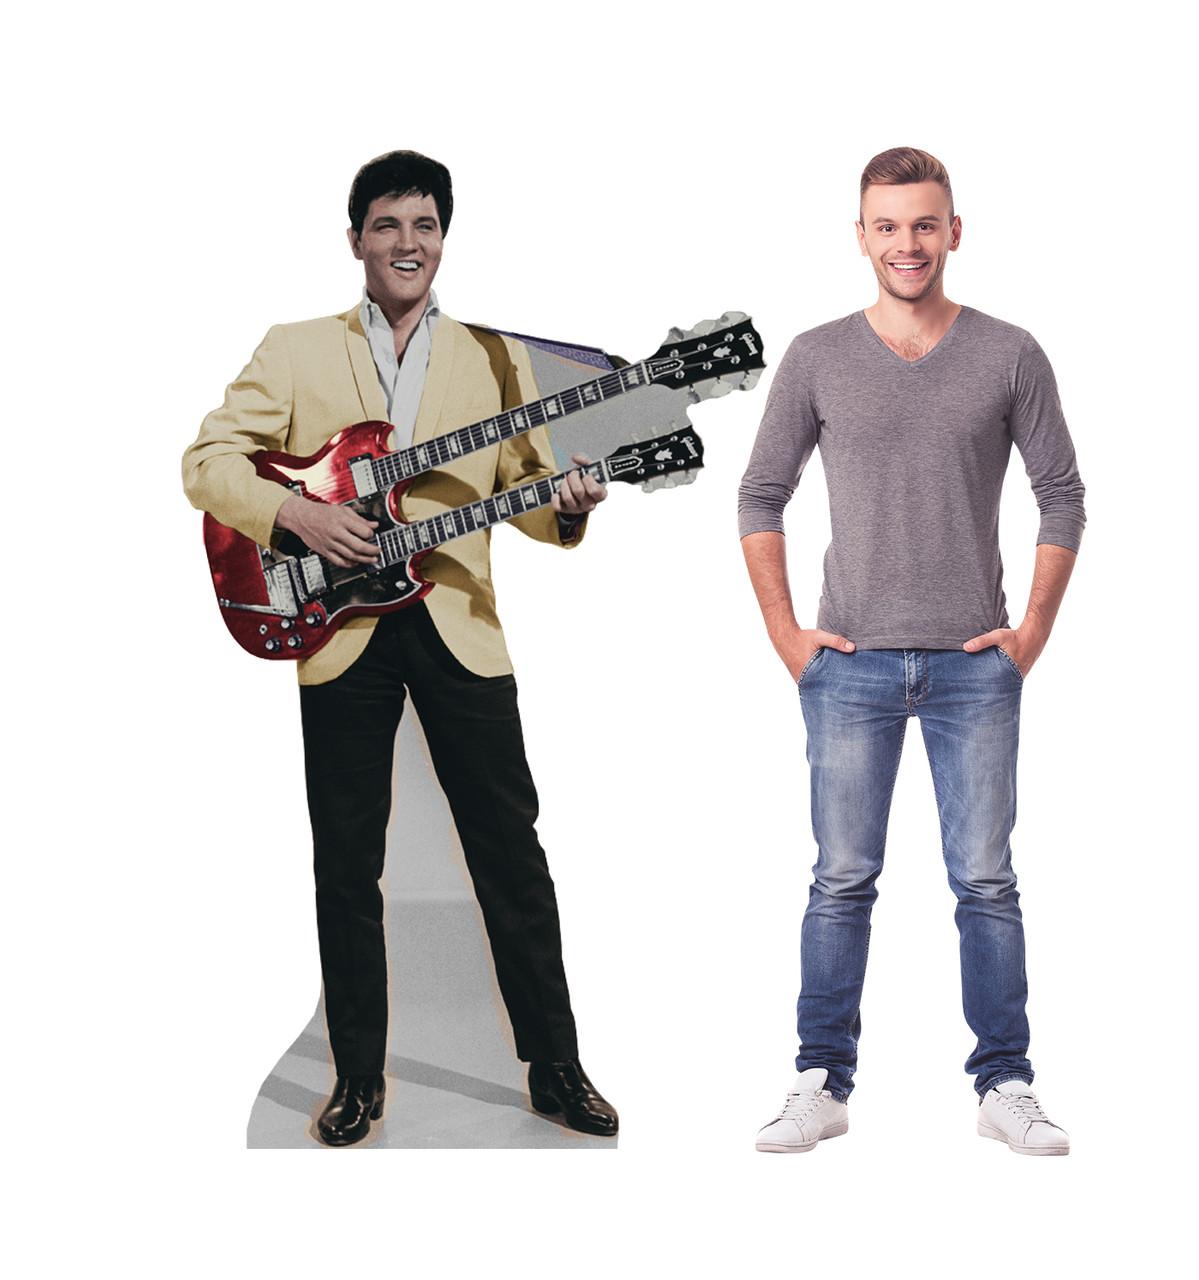 Life-size Elvis-Yellow Jacket Talking Cardboard Standup | Cardboard Cutout